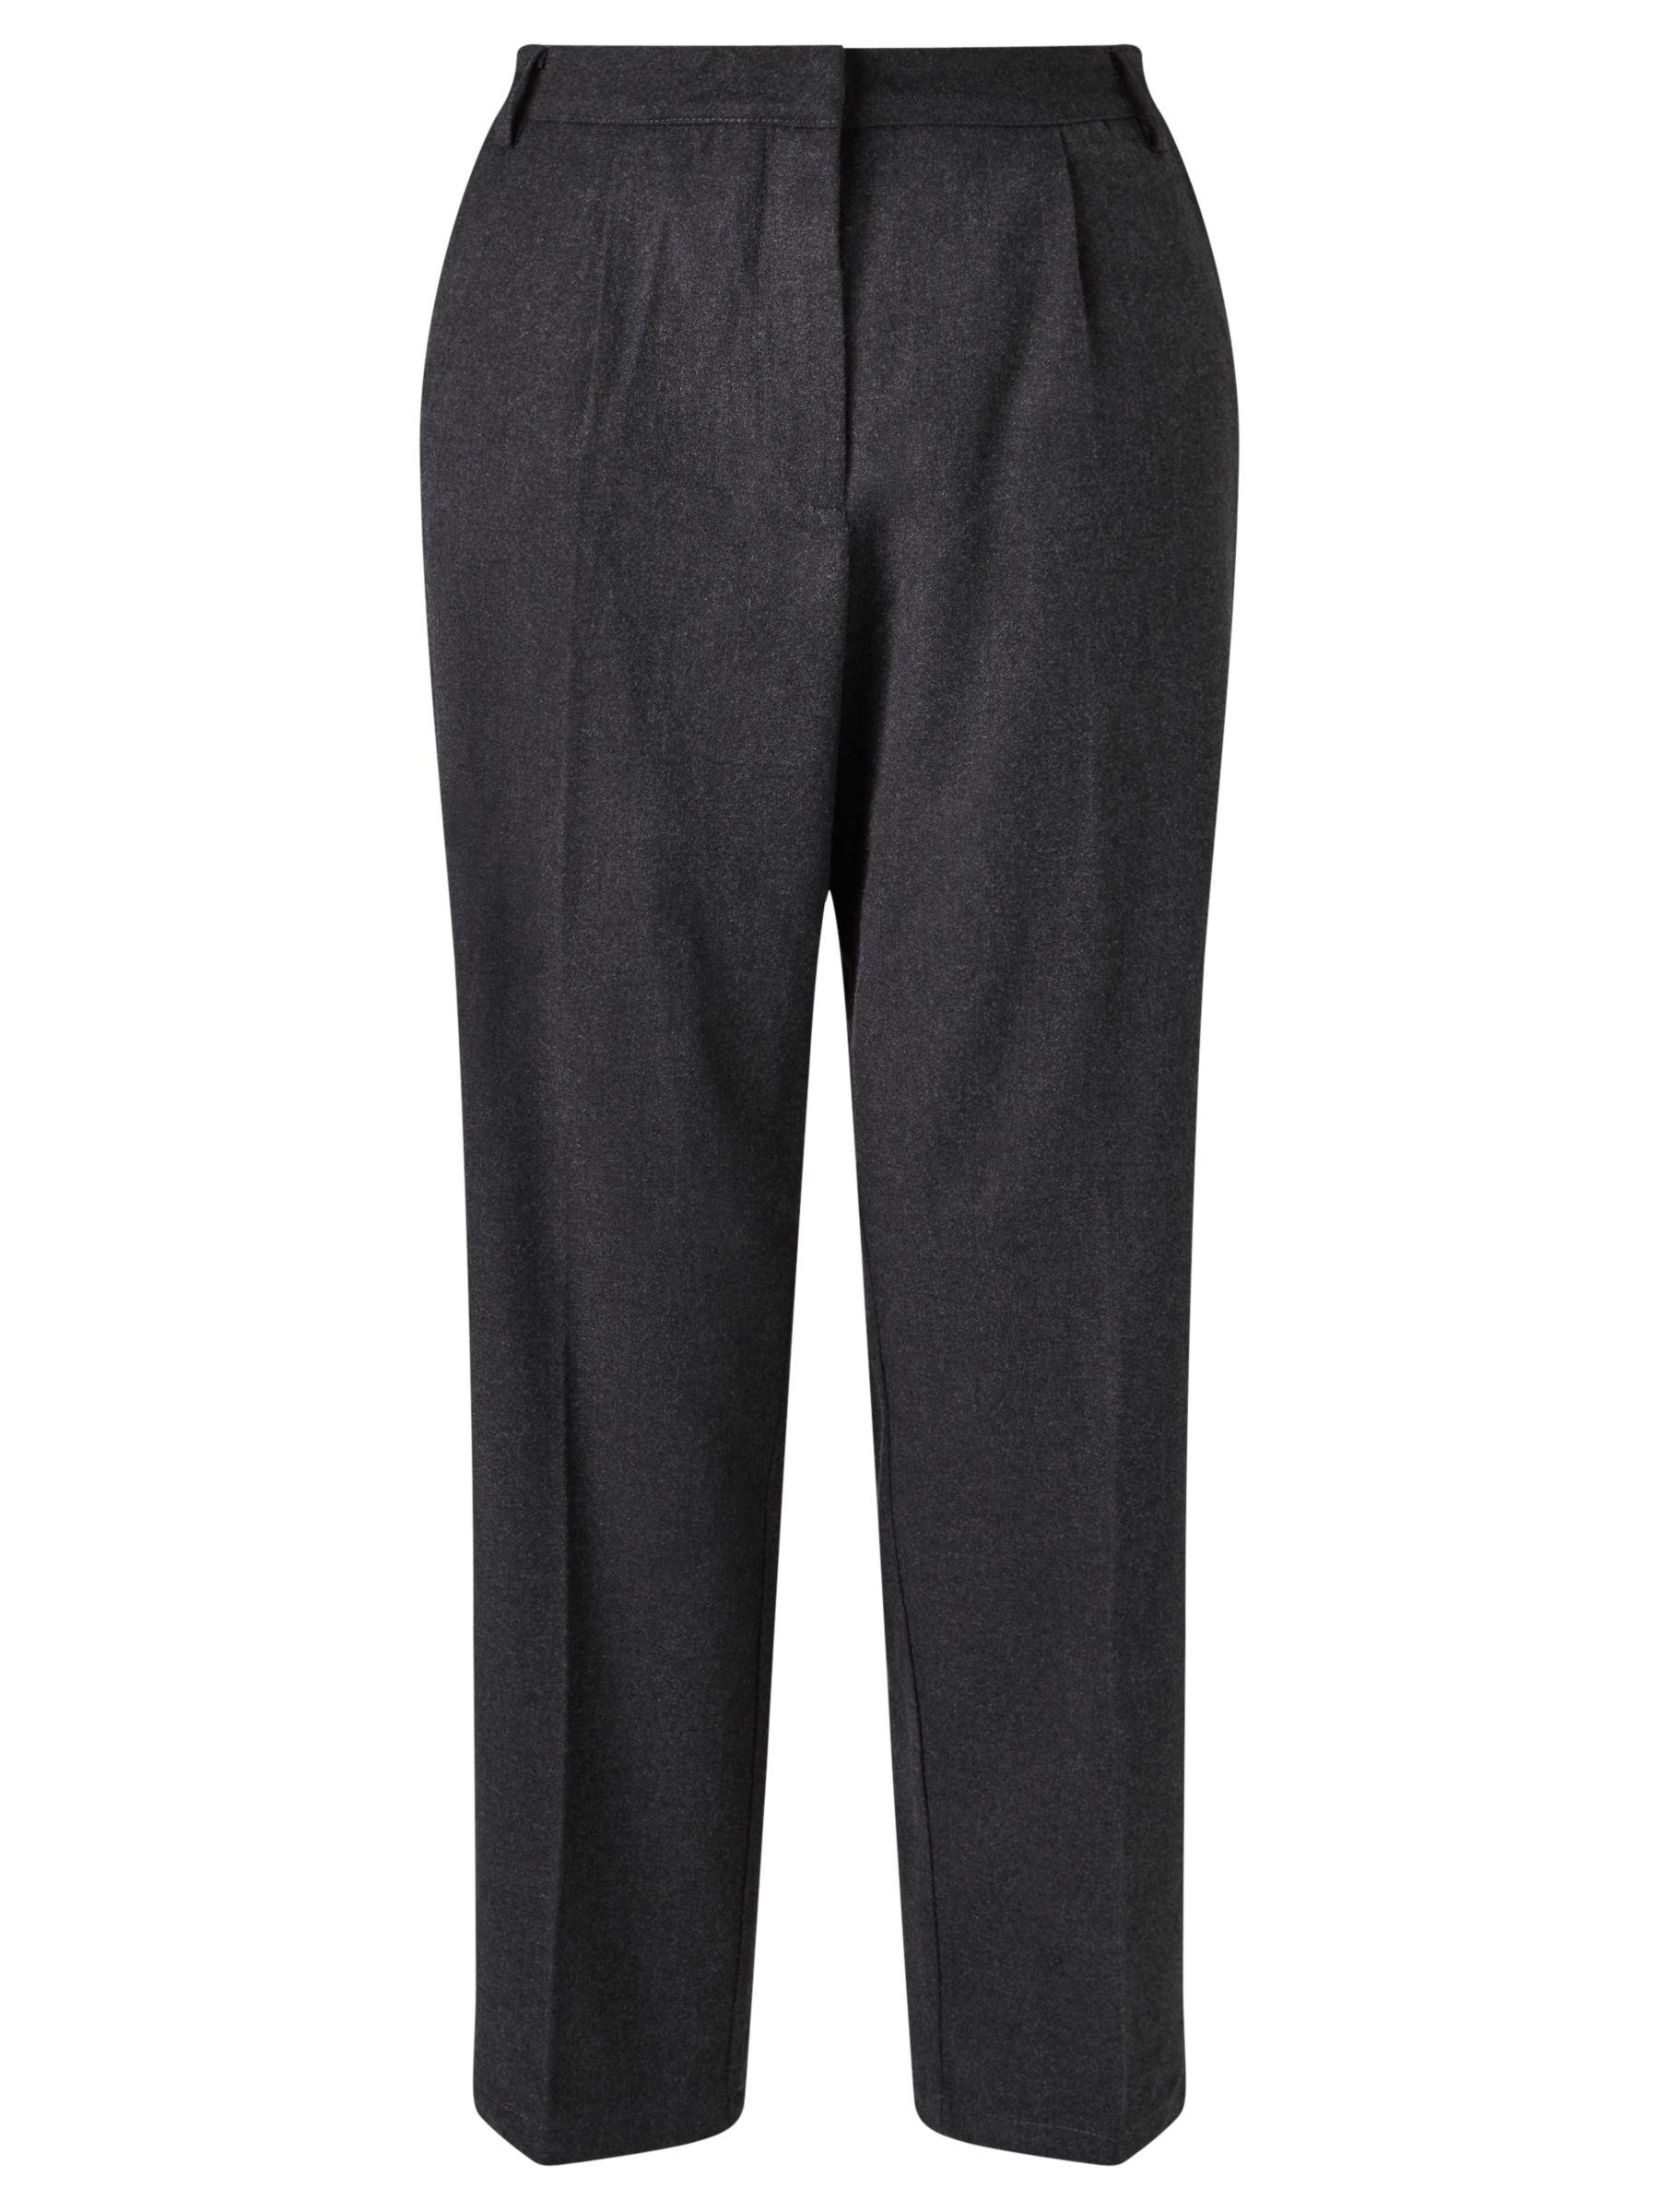 Minimum Minimum Birgitta Cropped Trousers, Grey